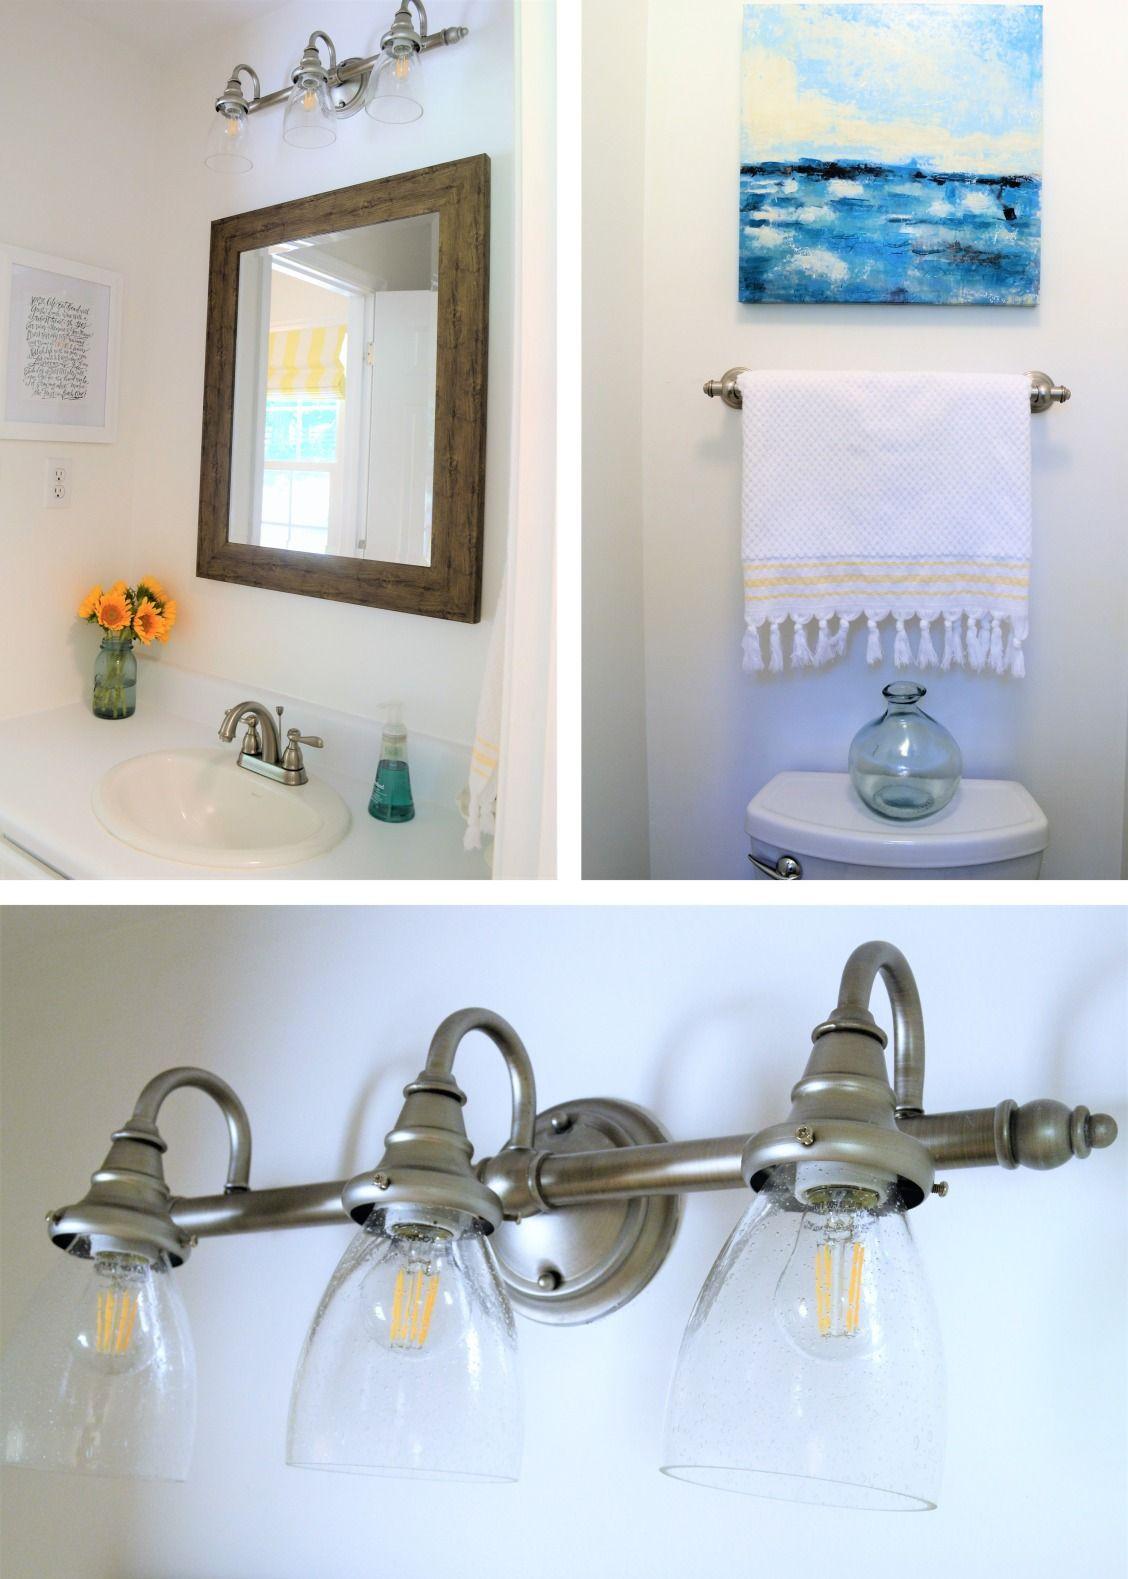 Badezimmer aus küchenideen easy ways to update your bathroom with loweus  remodel my bathroom